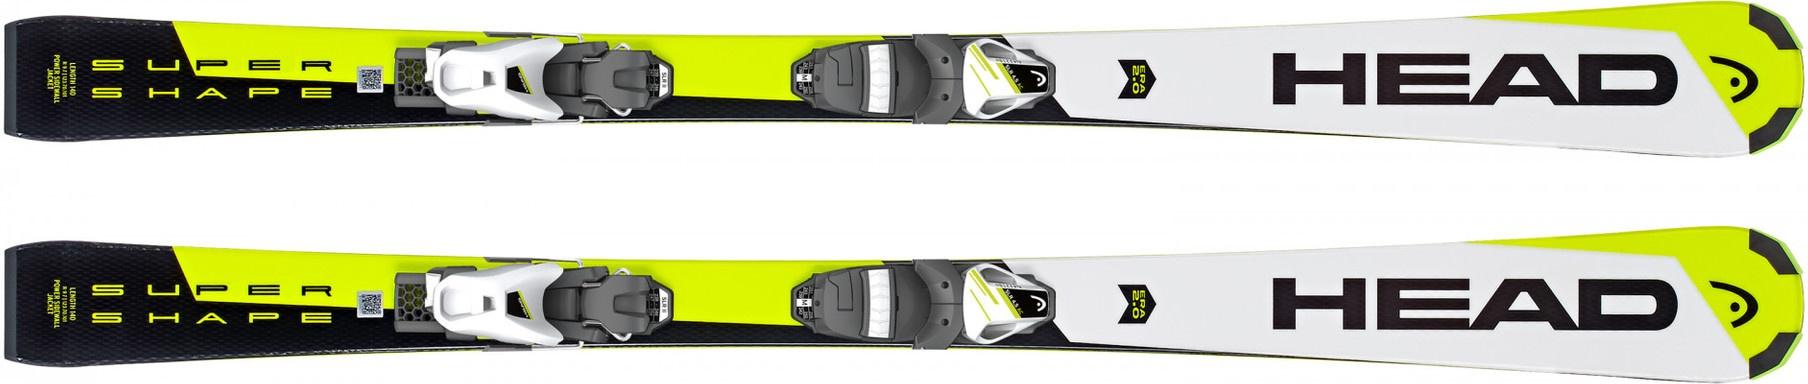 Горные лыжи Head Supershape SLR 2 White/Neon/Yellow + SLR 7.5 AC 2019, 150 см фото